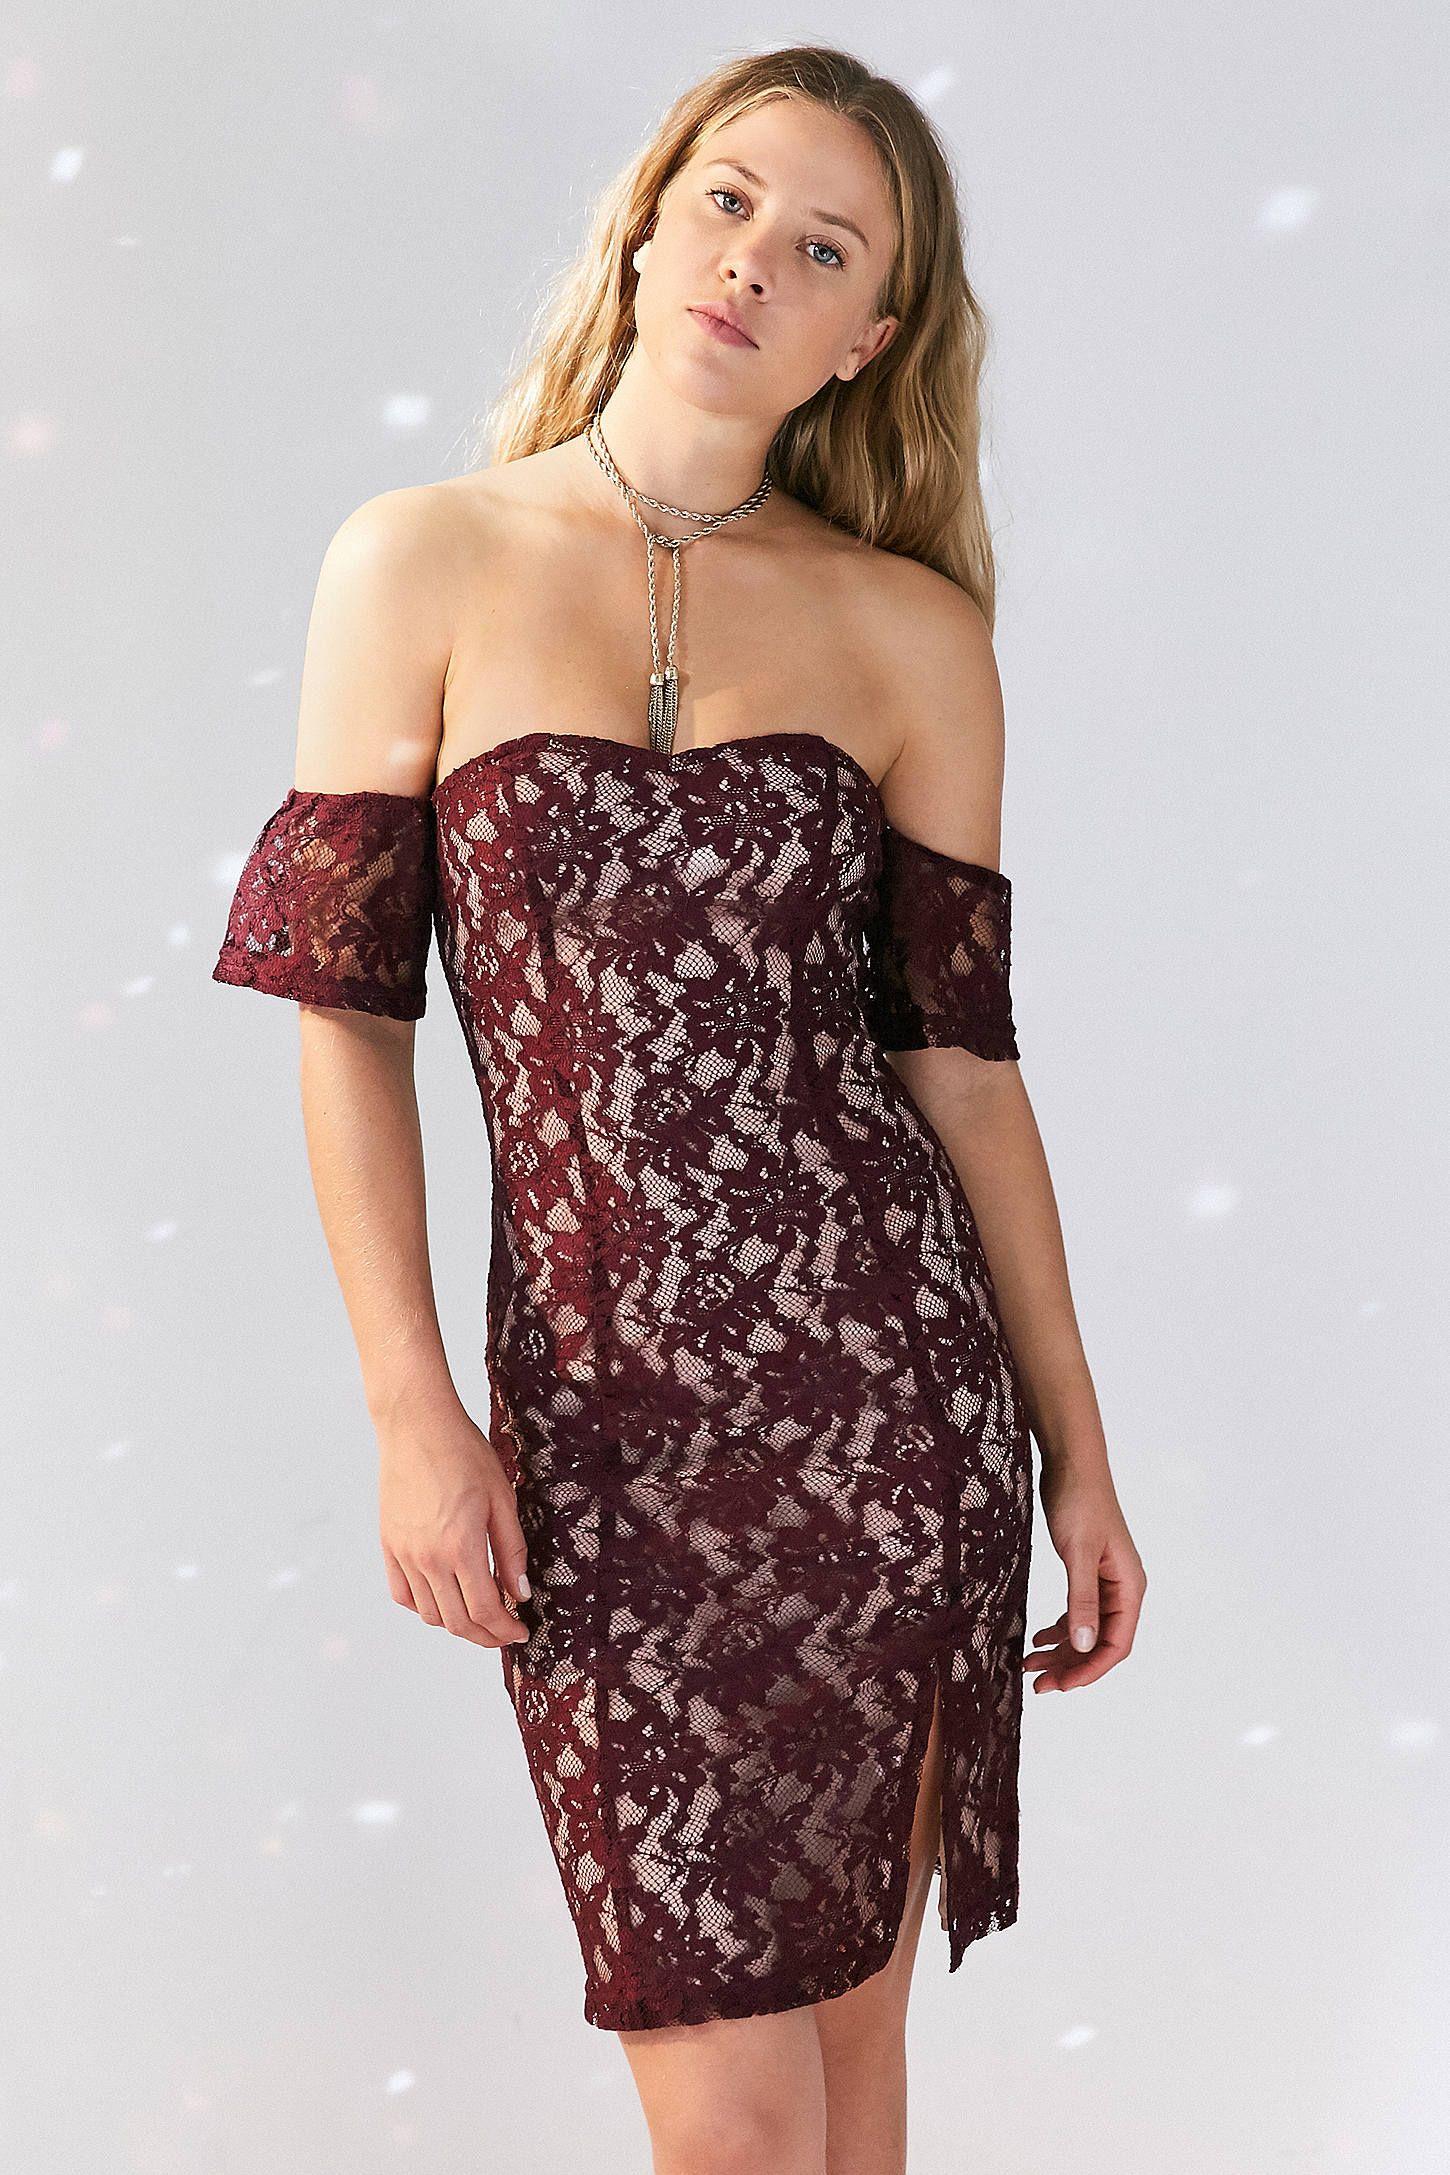 Skater Dress For Women - Cheap Frills Jewellery